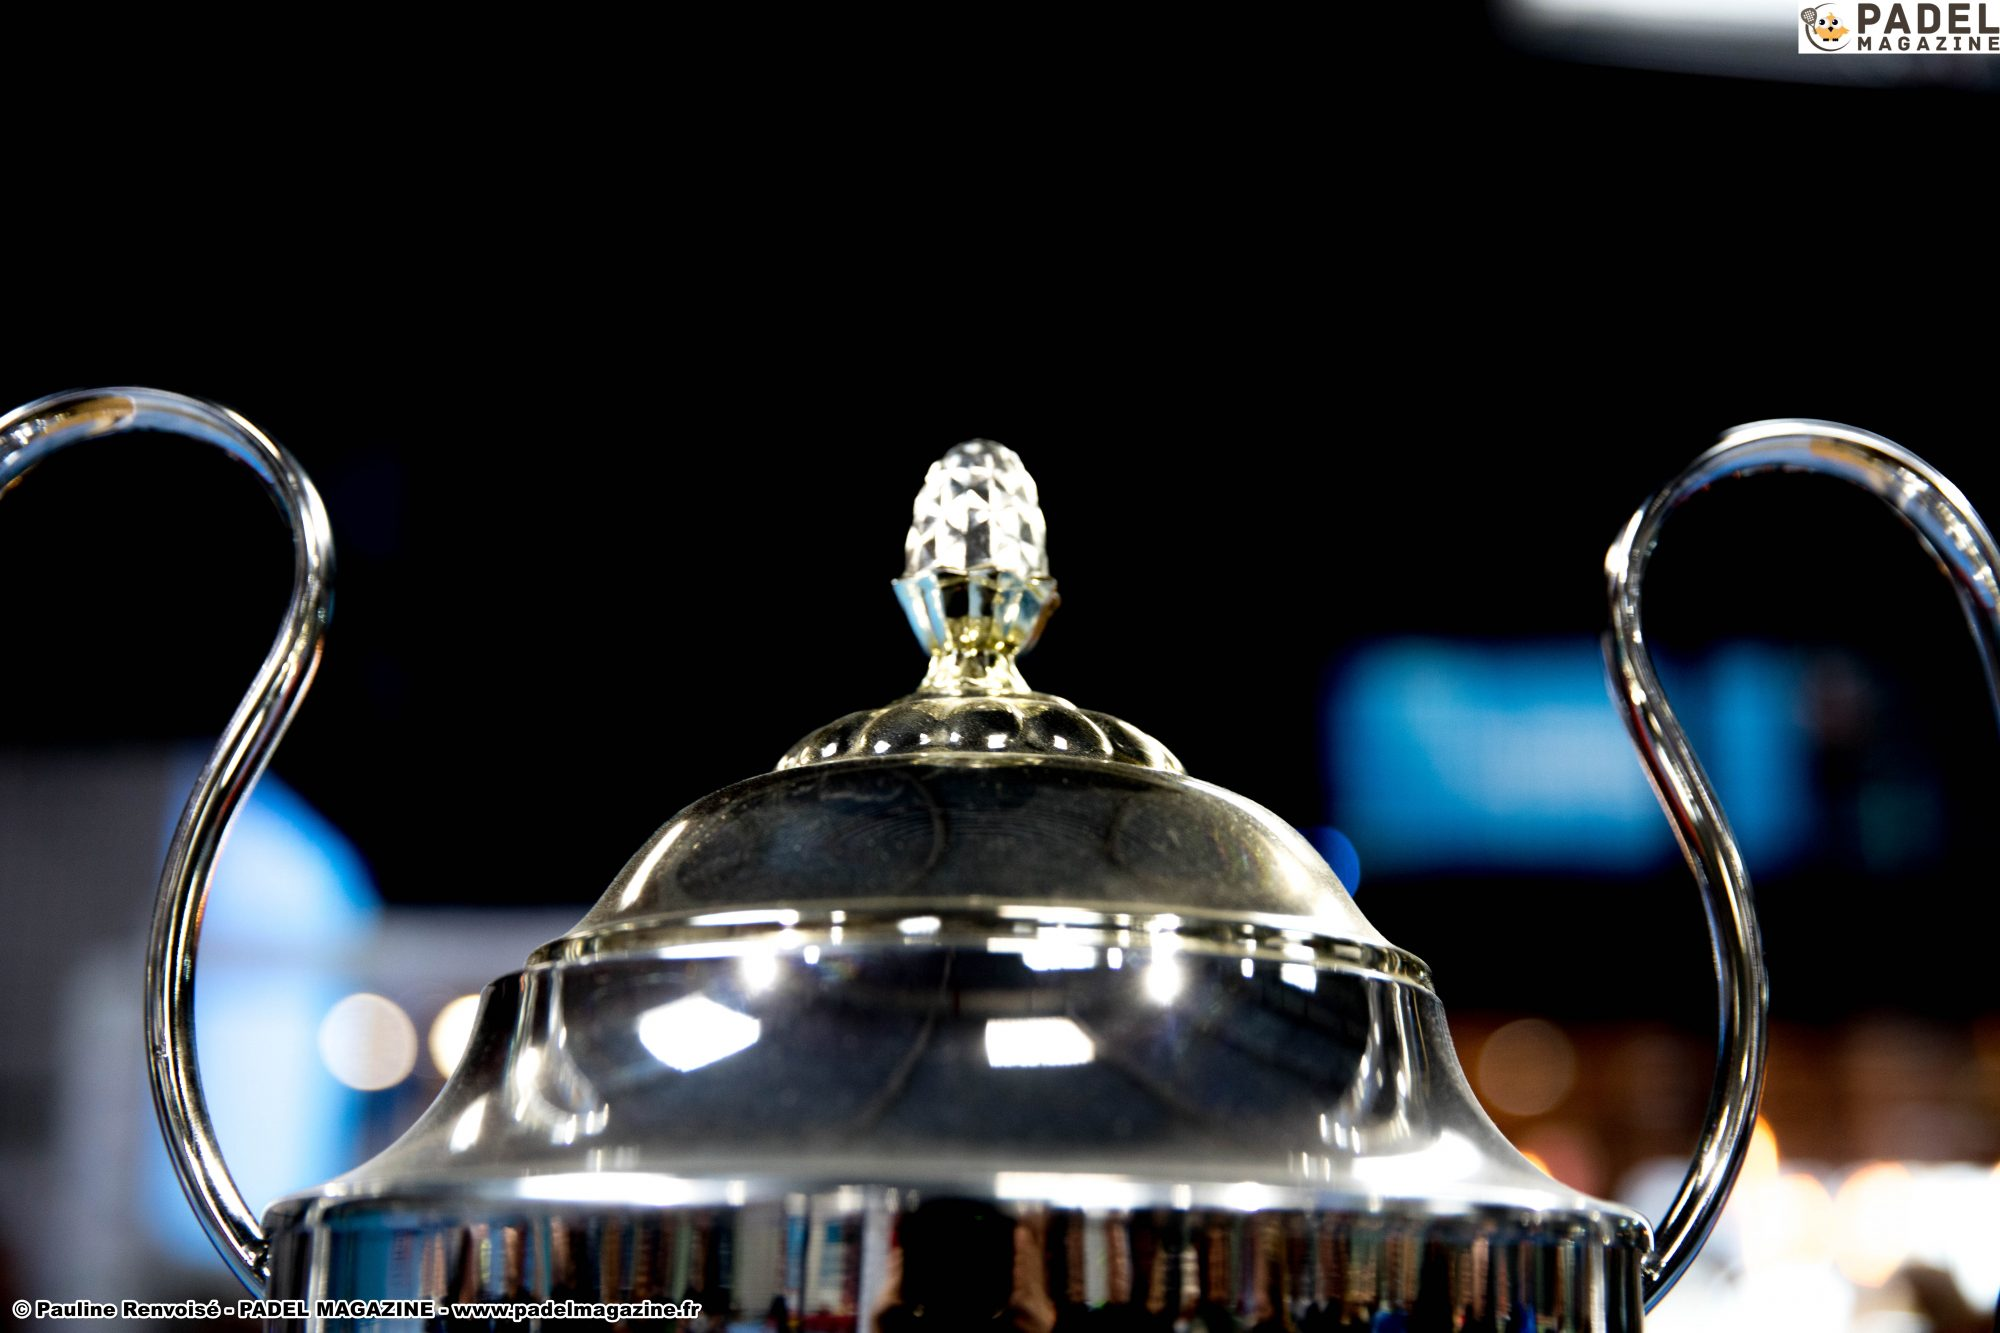 coupe euro padel cup casa padel 2018